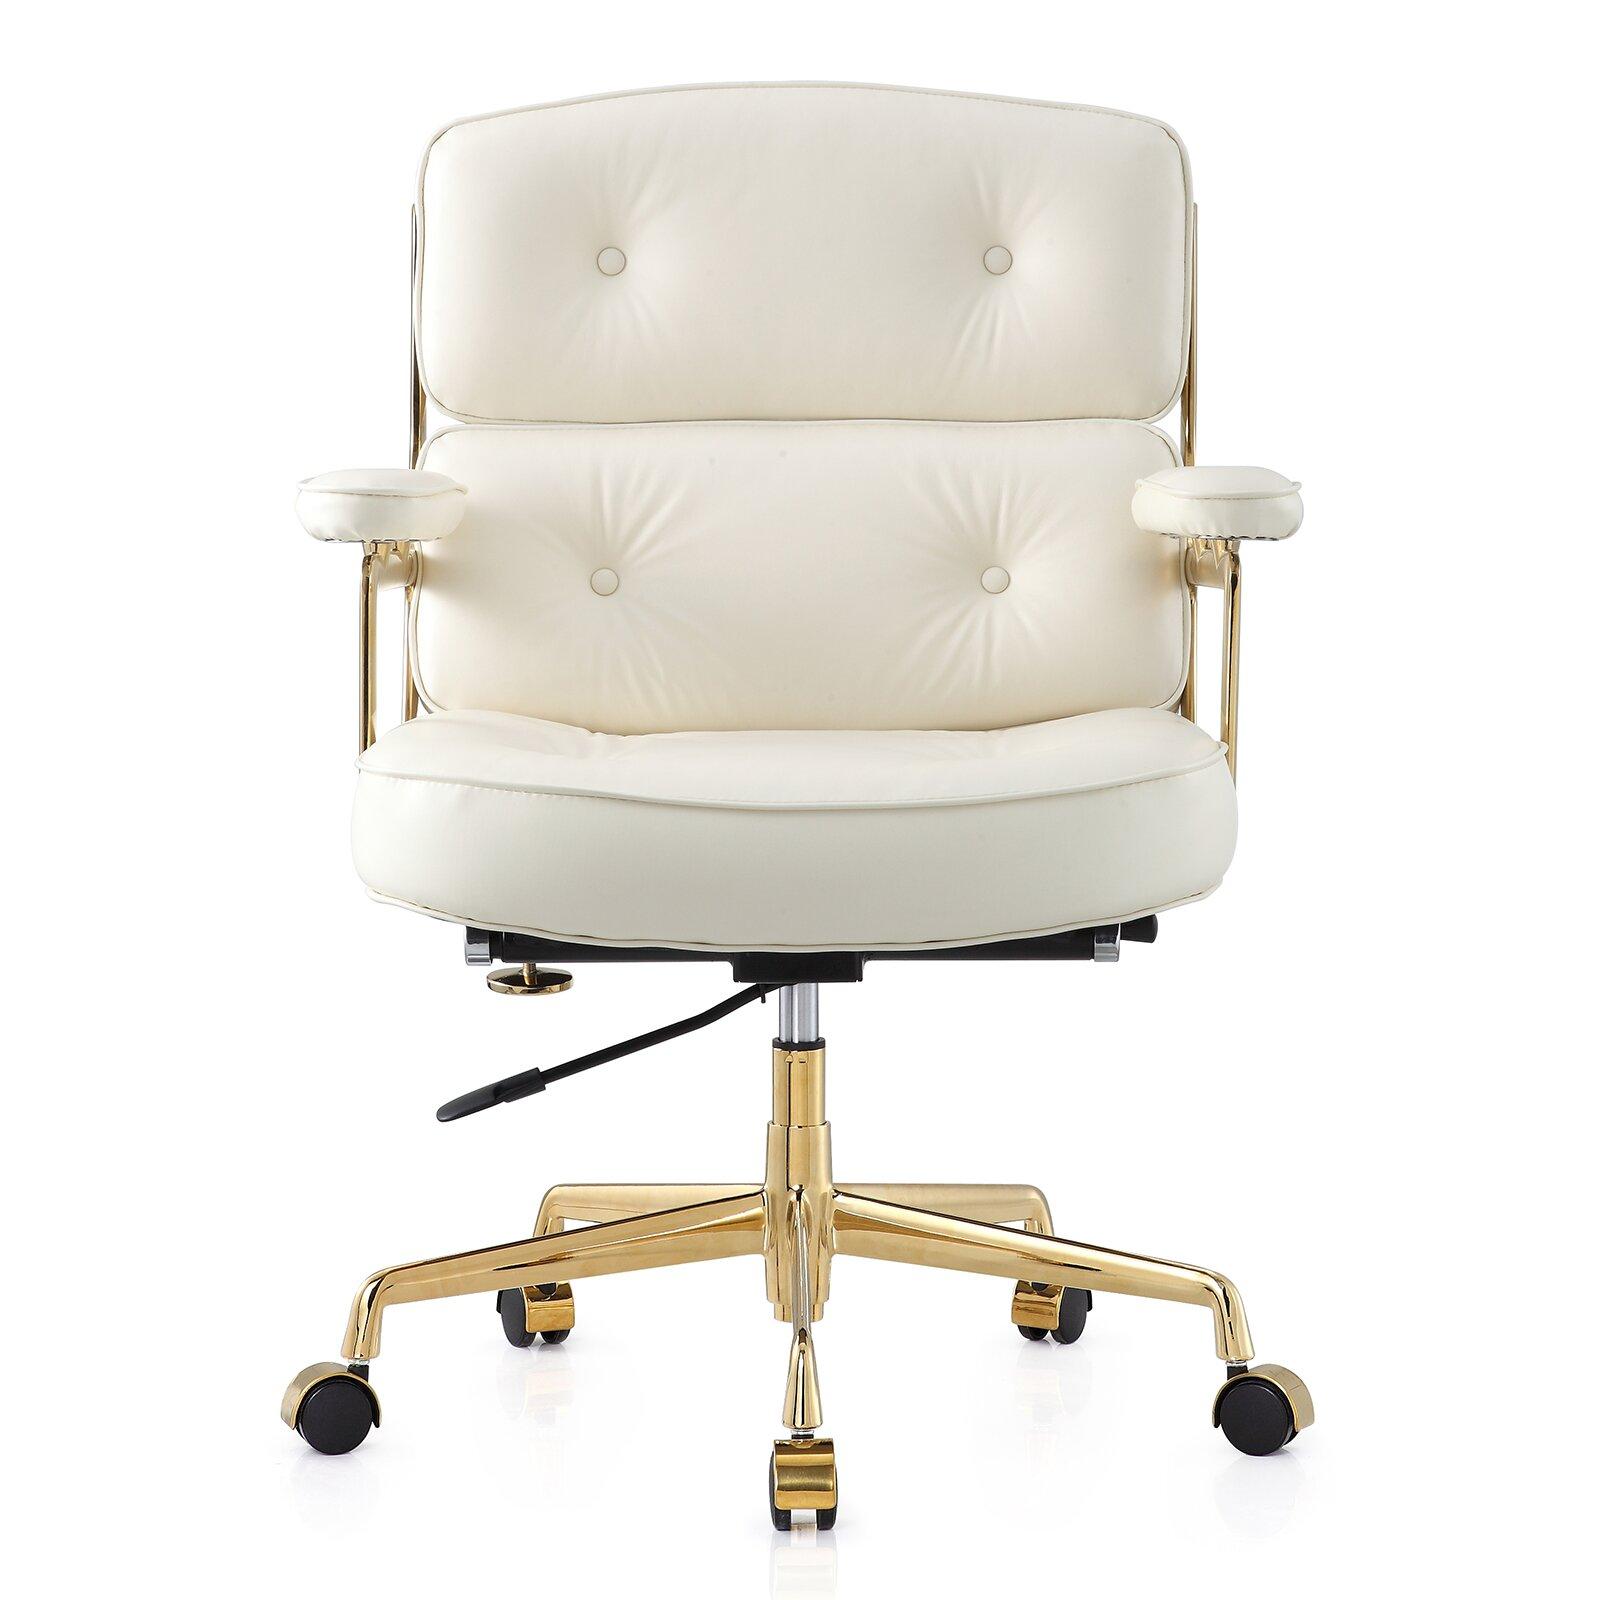 Tan leather office chair - 16 Leather Office Chair With Lumbar Support